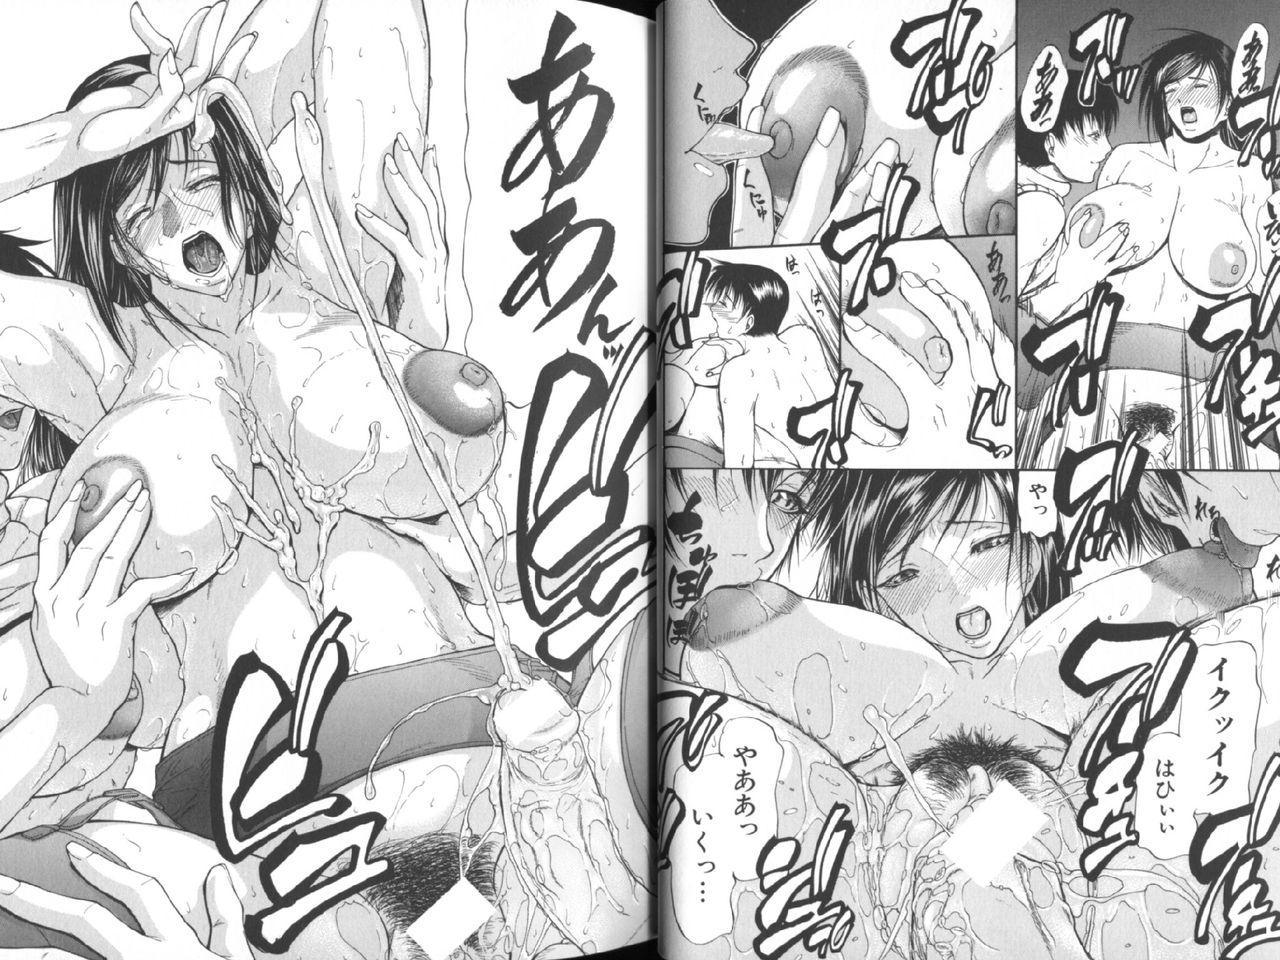 Senjou - A Desire is Instigated 21